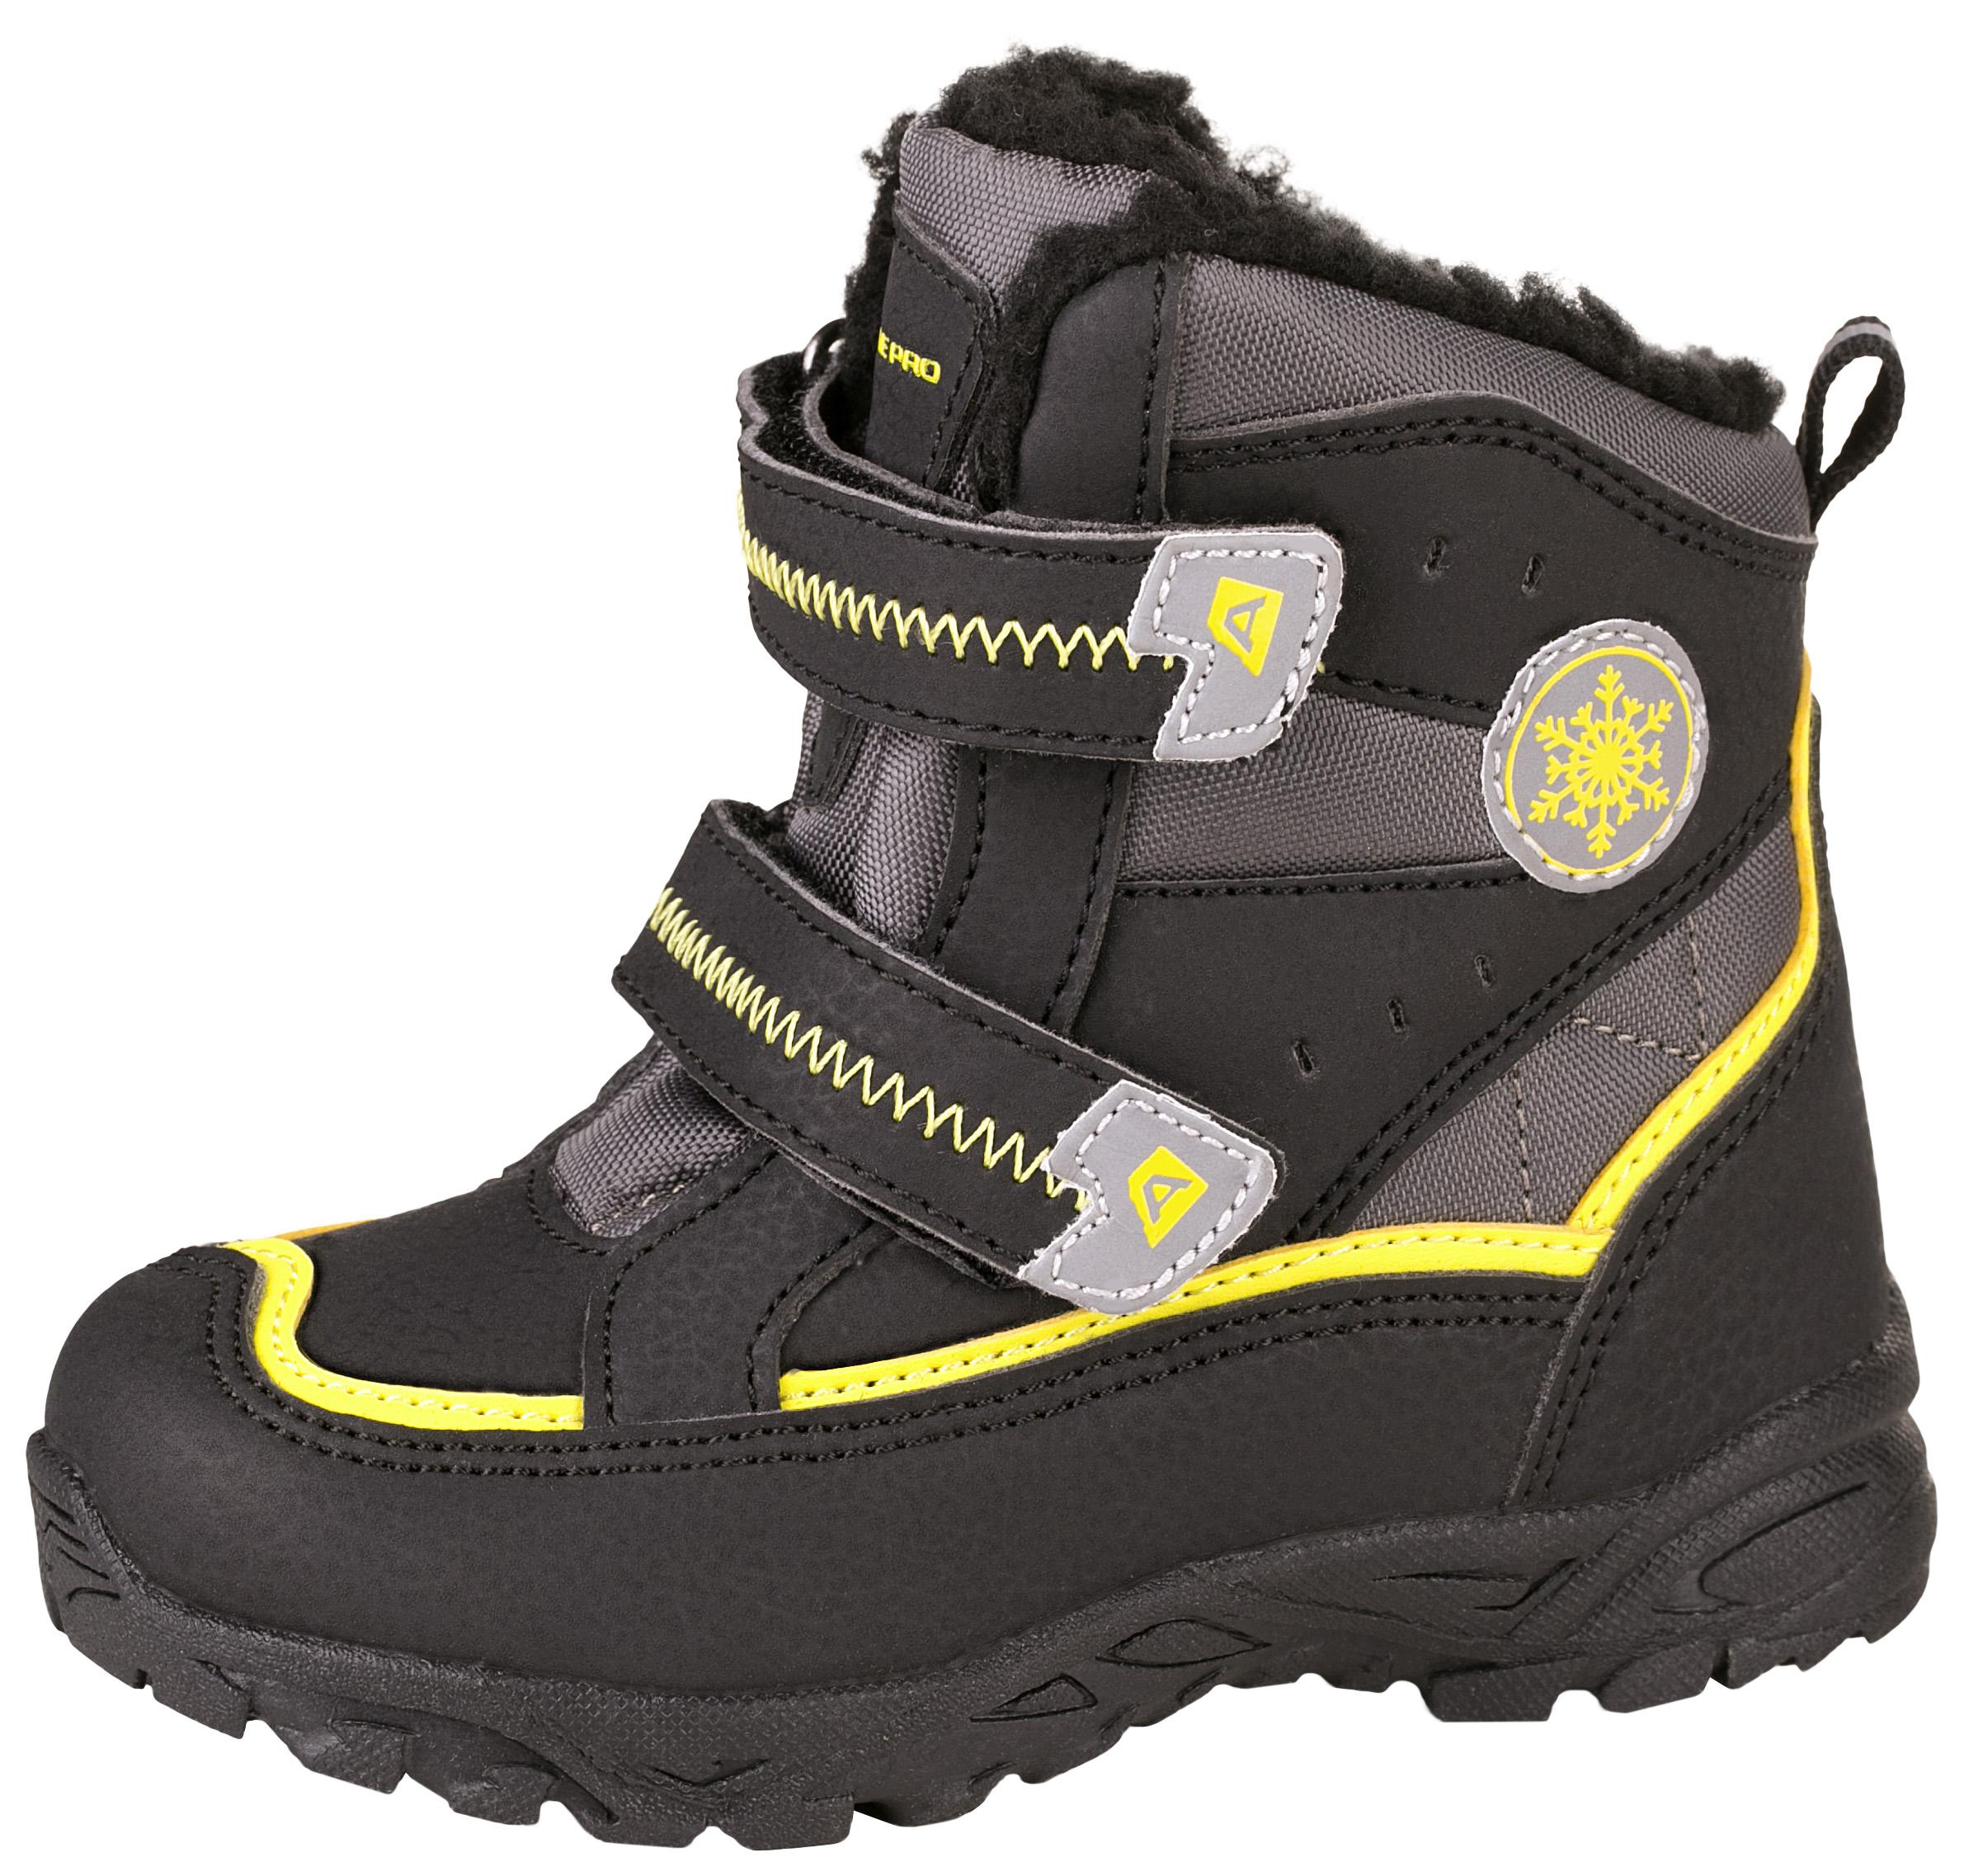 b54cea8c3 ALPINE PRO Detská zimná obuv Kibbi - žlto-čierna, EUR 26 ...